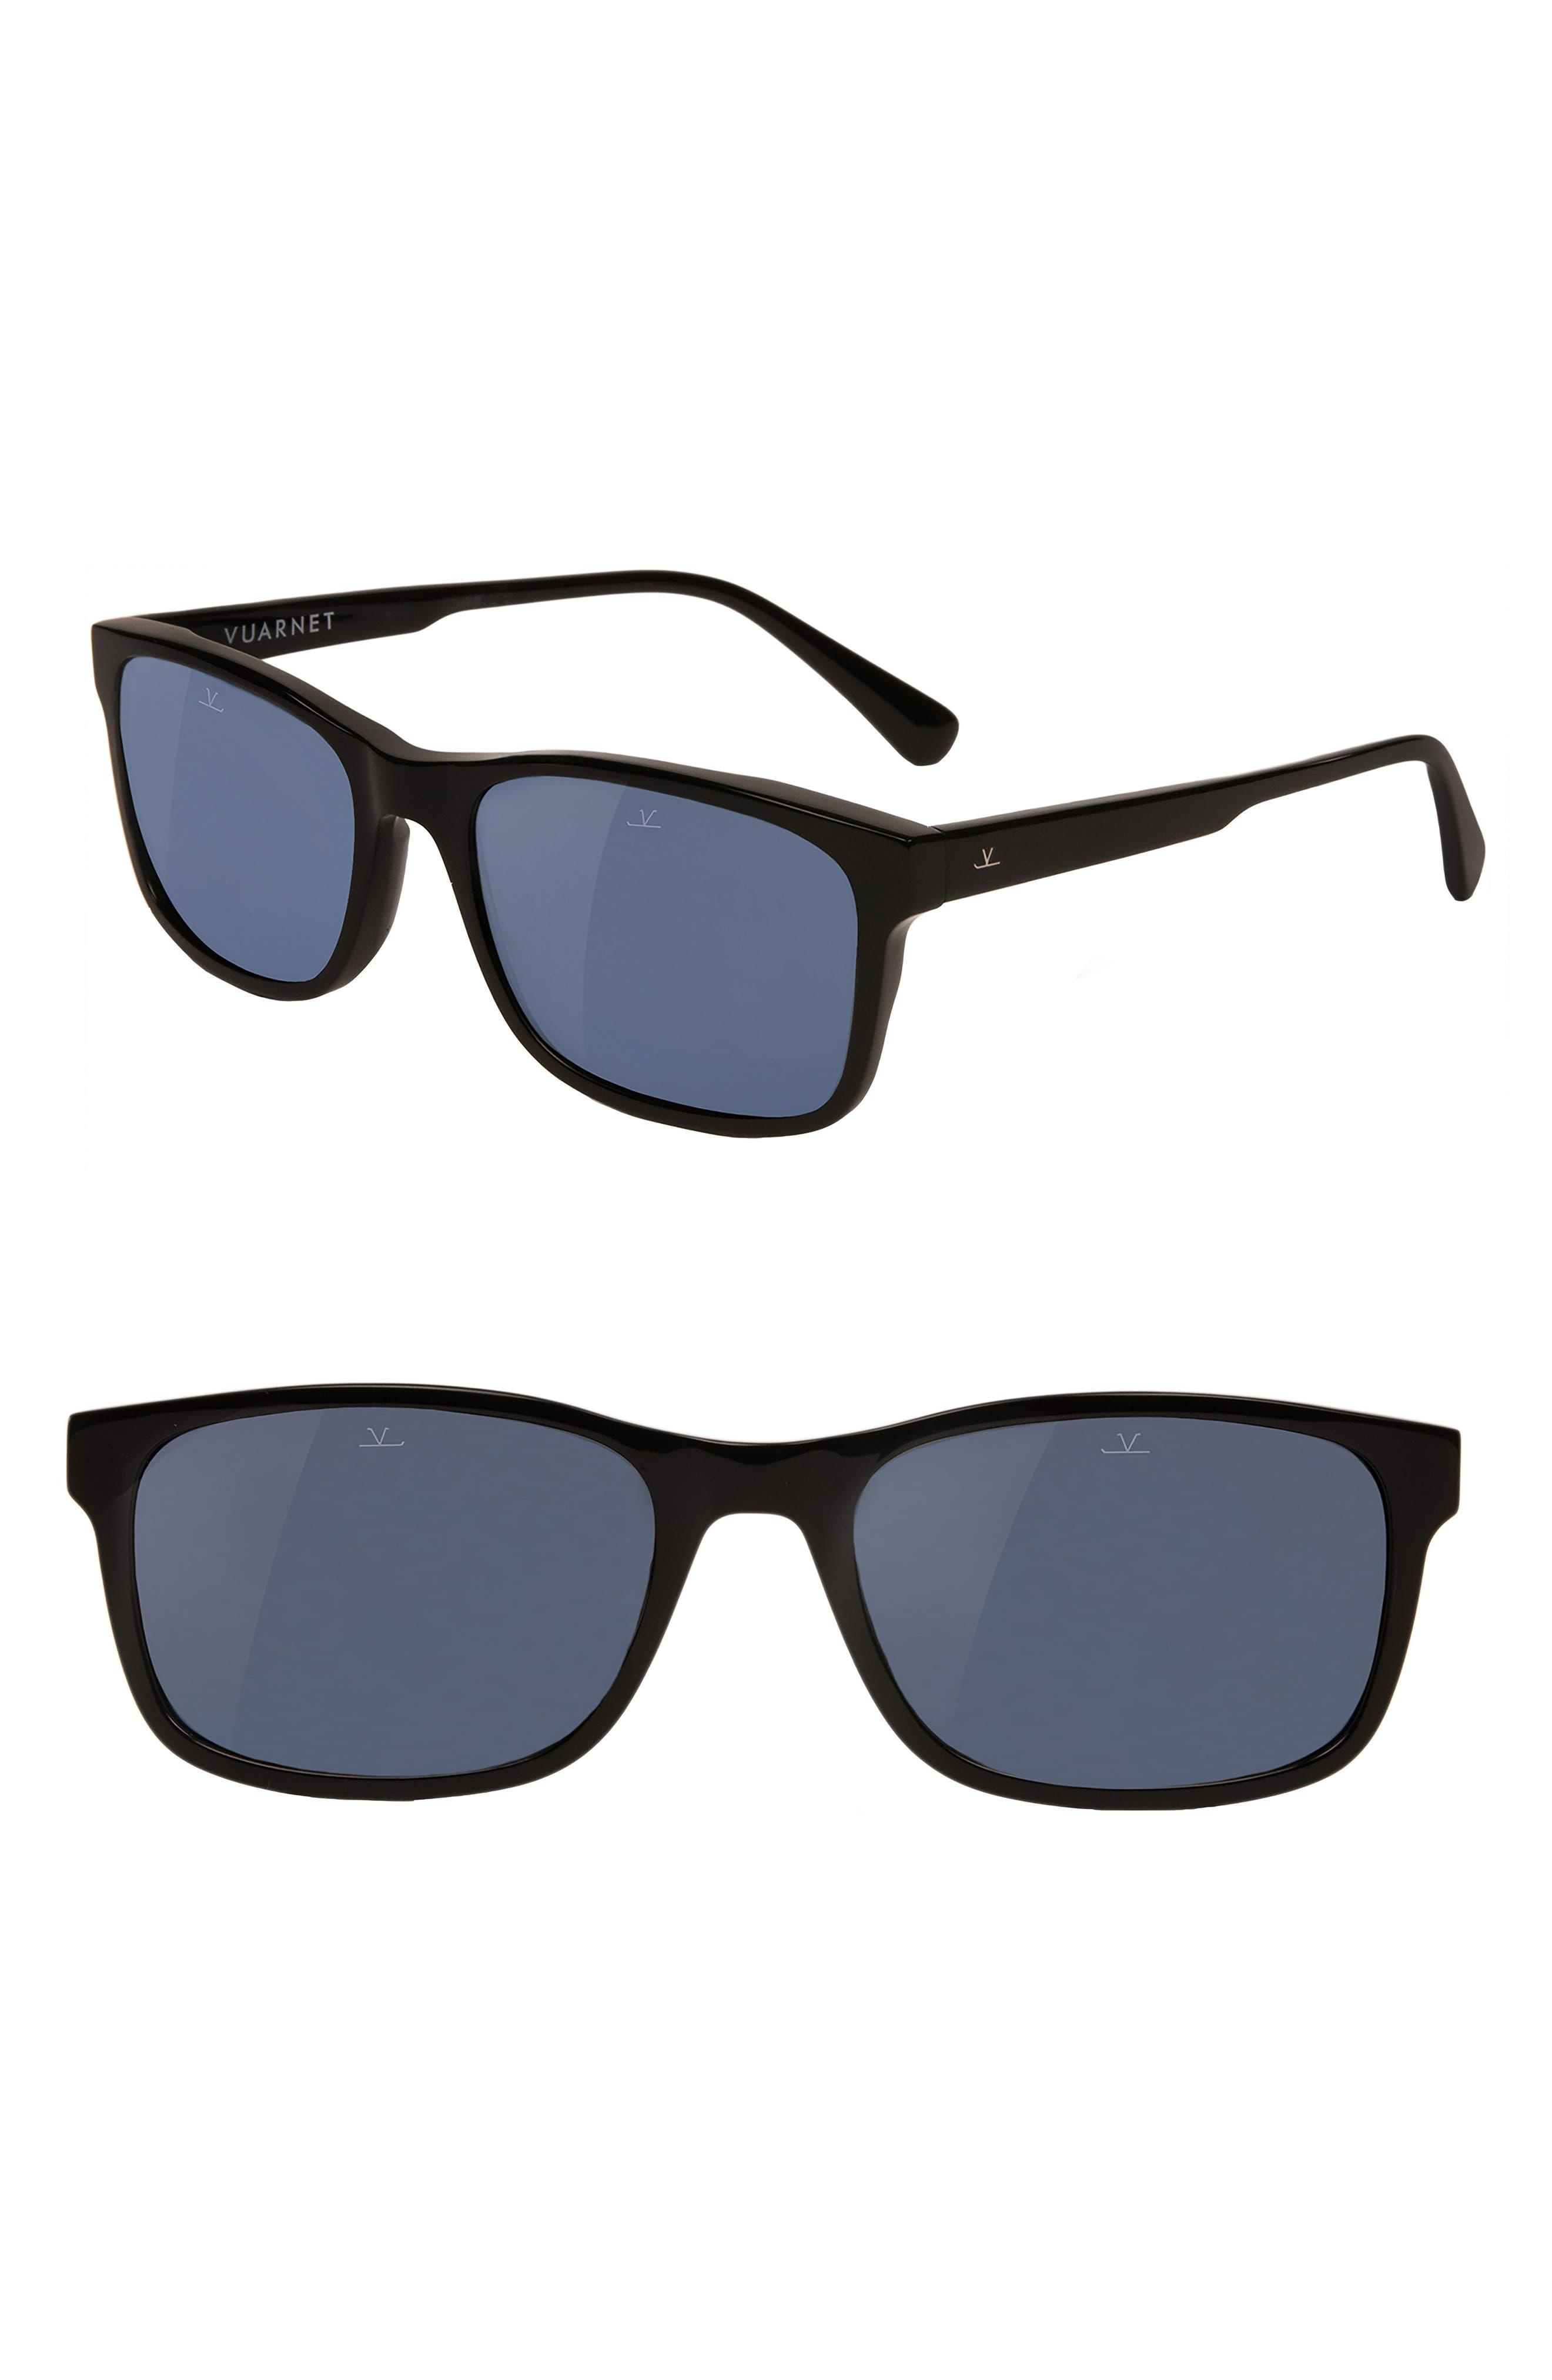 District Medium 55mm Polarized Sunglasses,                             Main thumbnail 1, color,